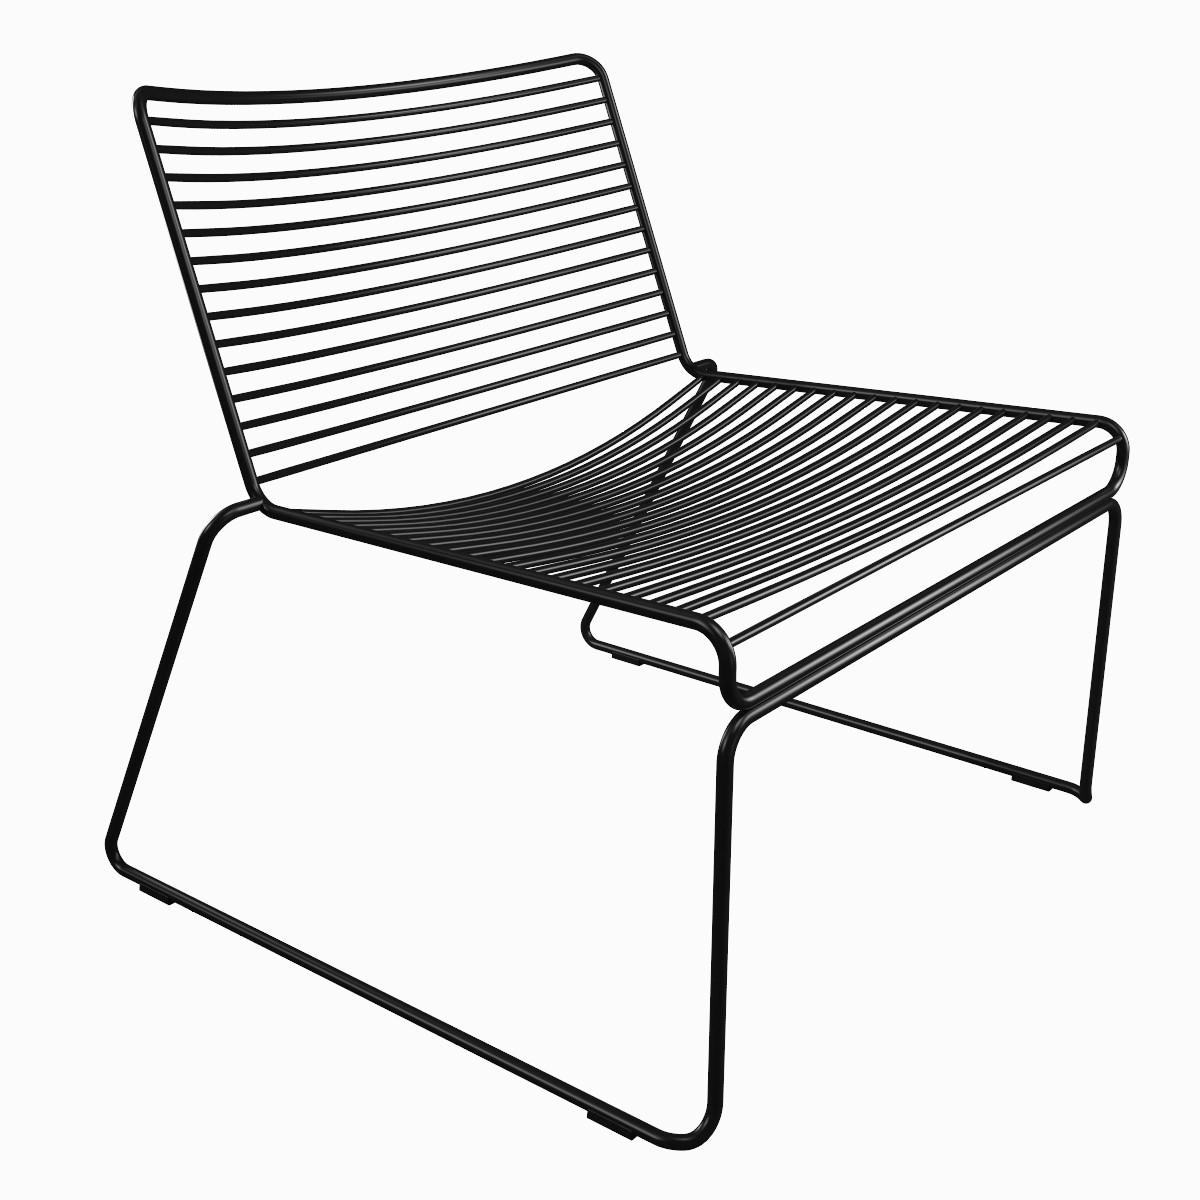 hay hee lounge chair obj. Black Bedroom Furniture Sets. Home Design Ideas